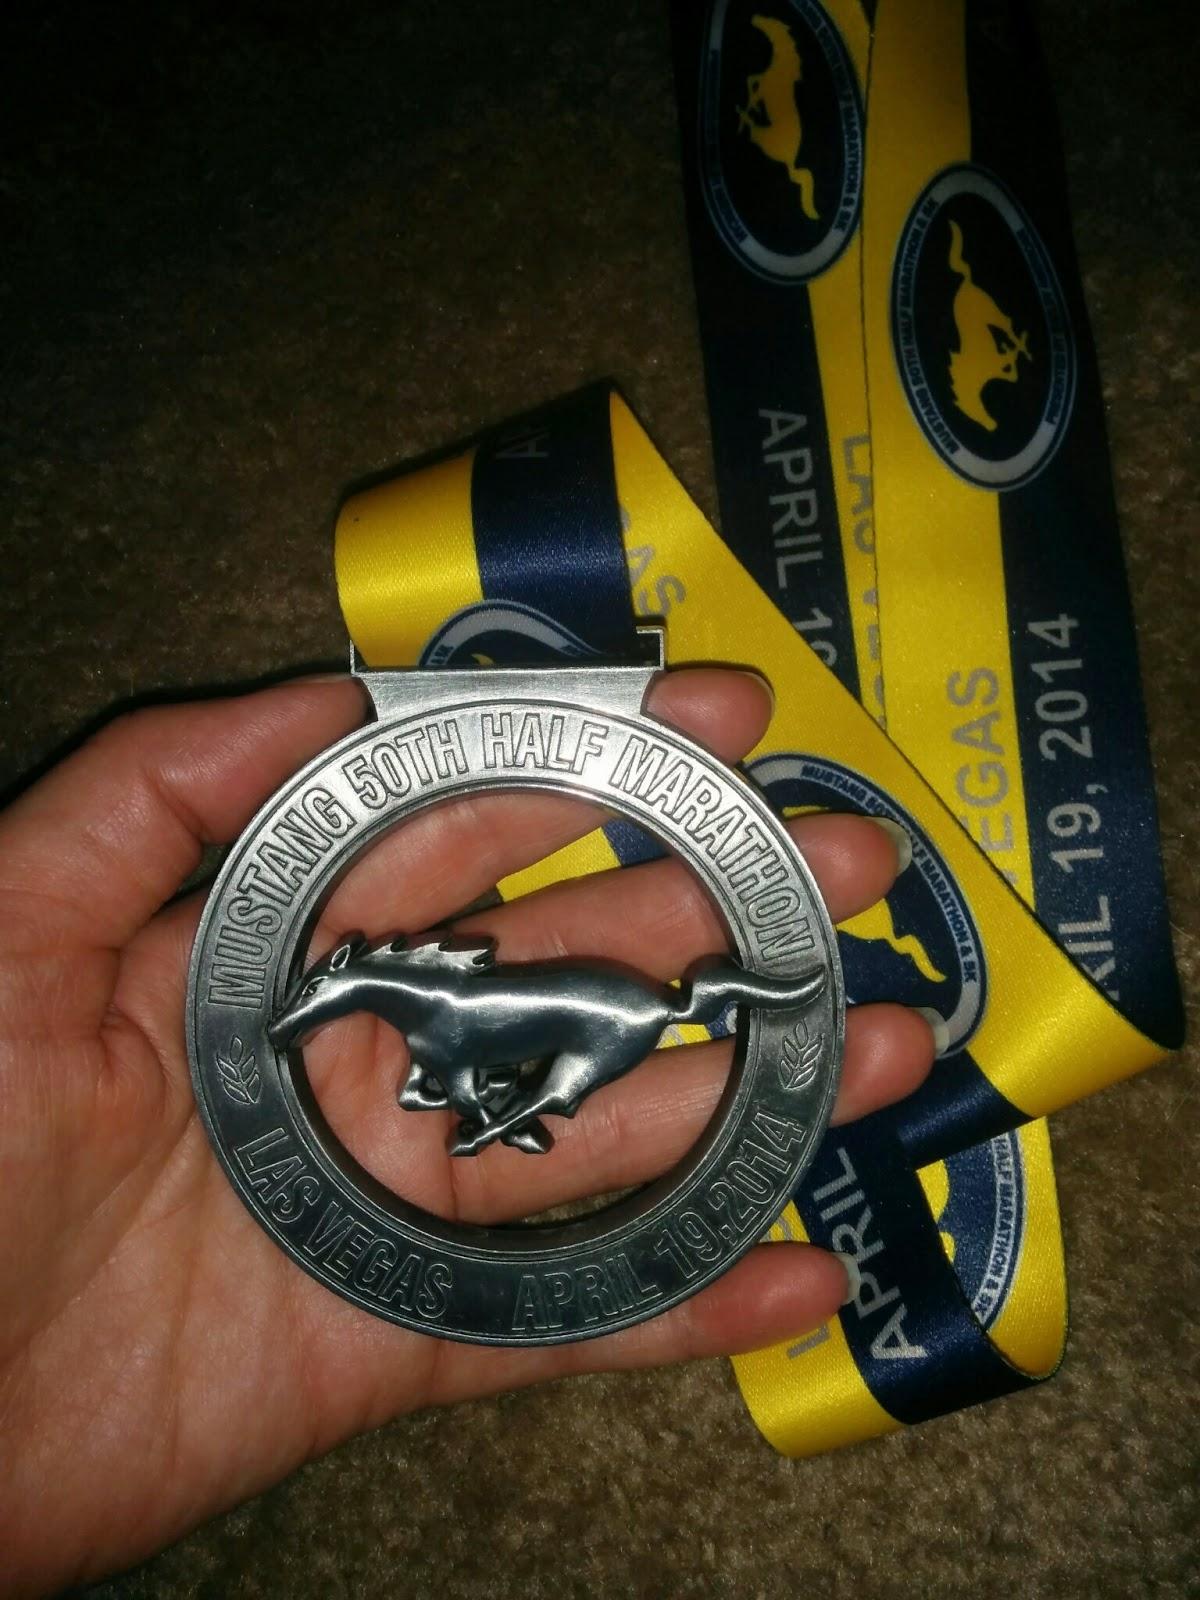 Mustang 50th Half Marathon